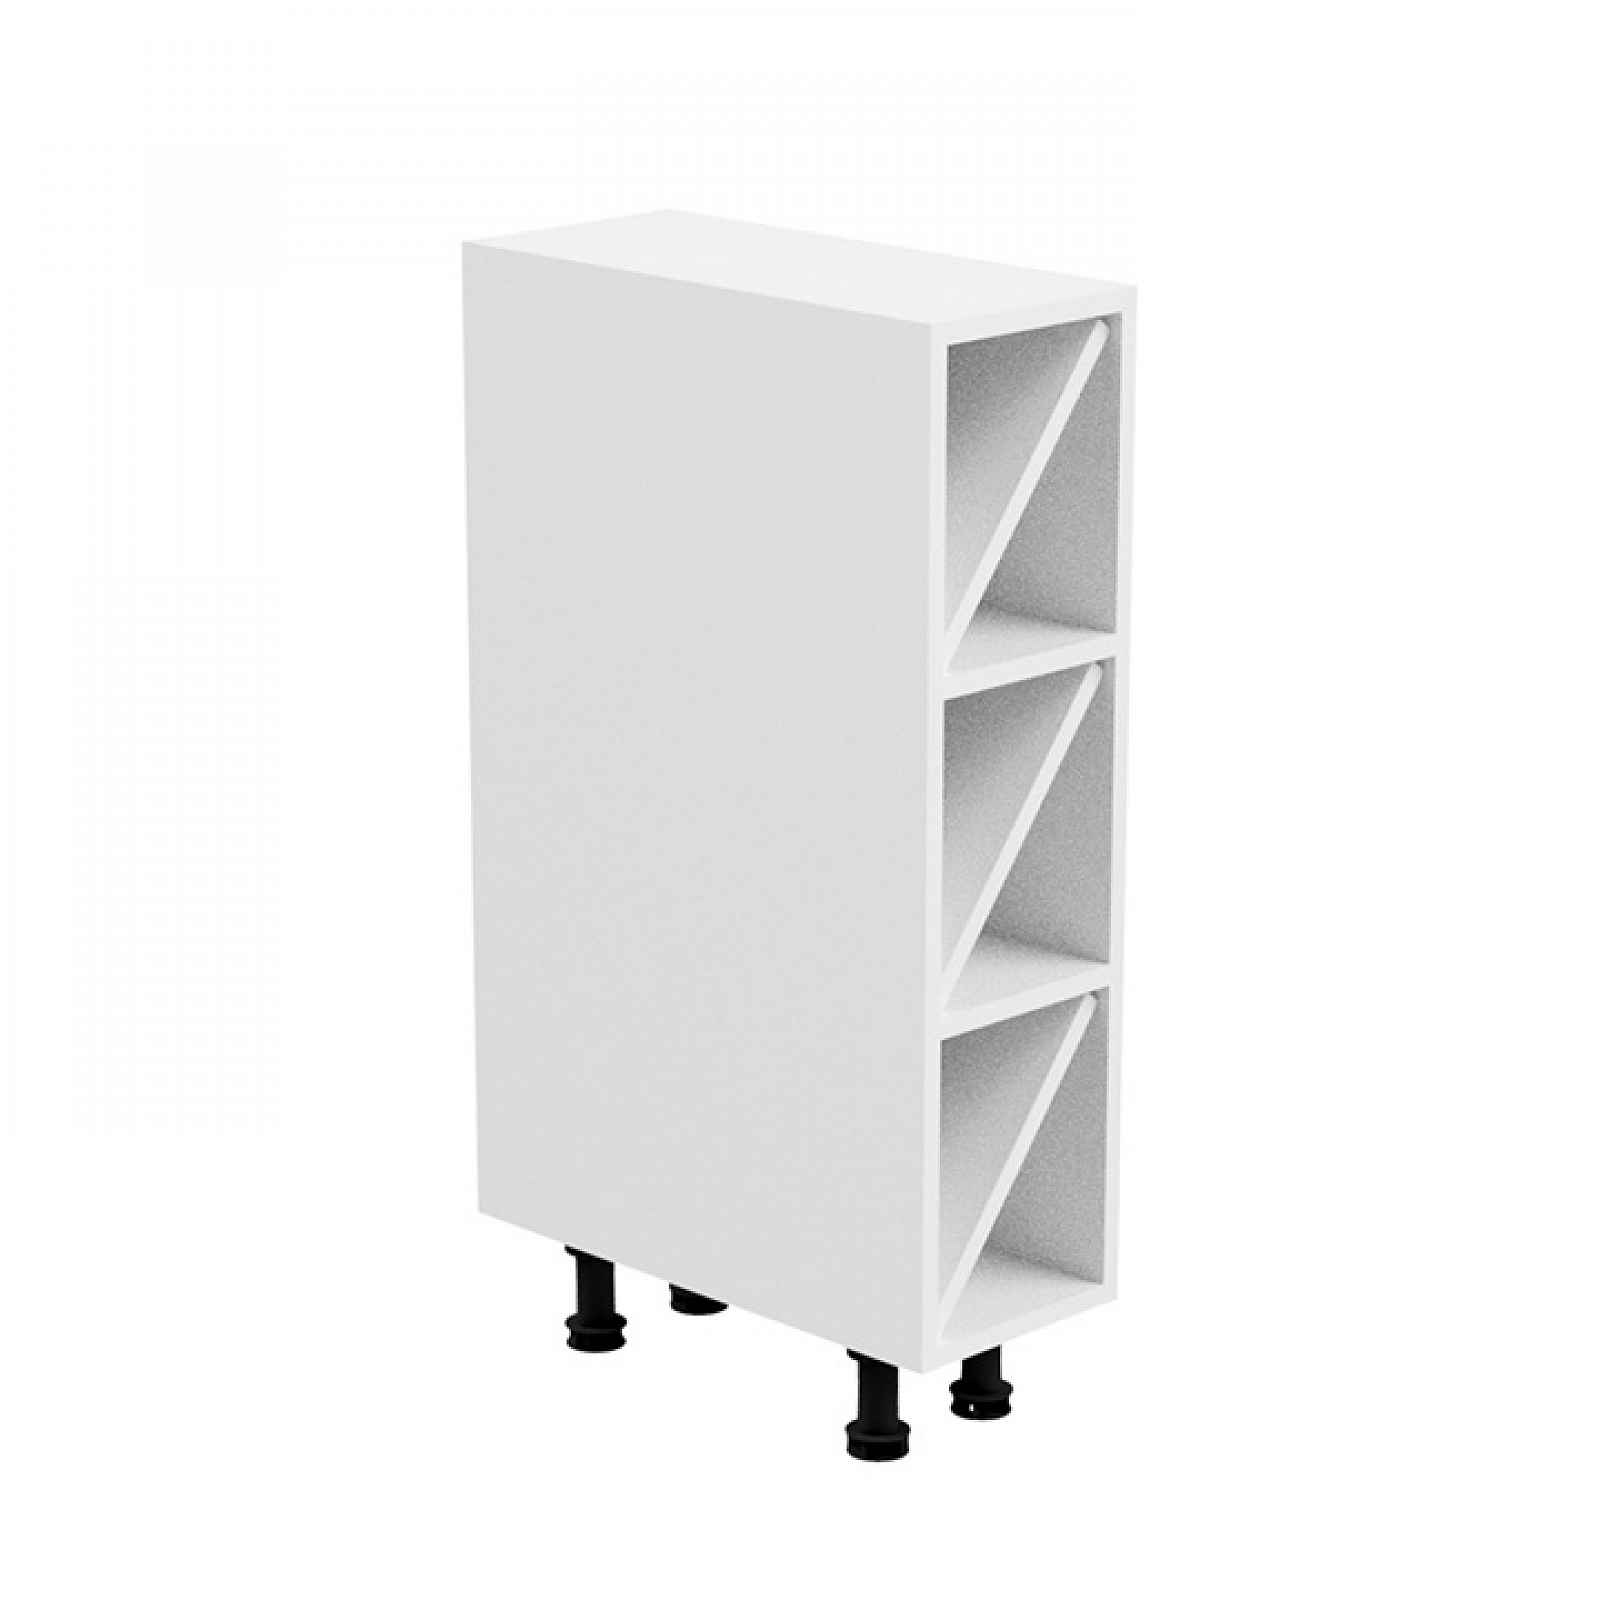 Spodní skříňka, bílá, AURORA D20W 0000236727 Tempo Kondela